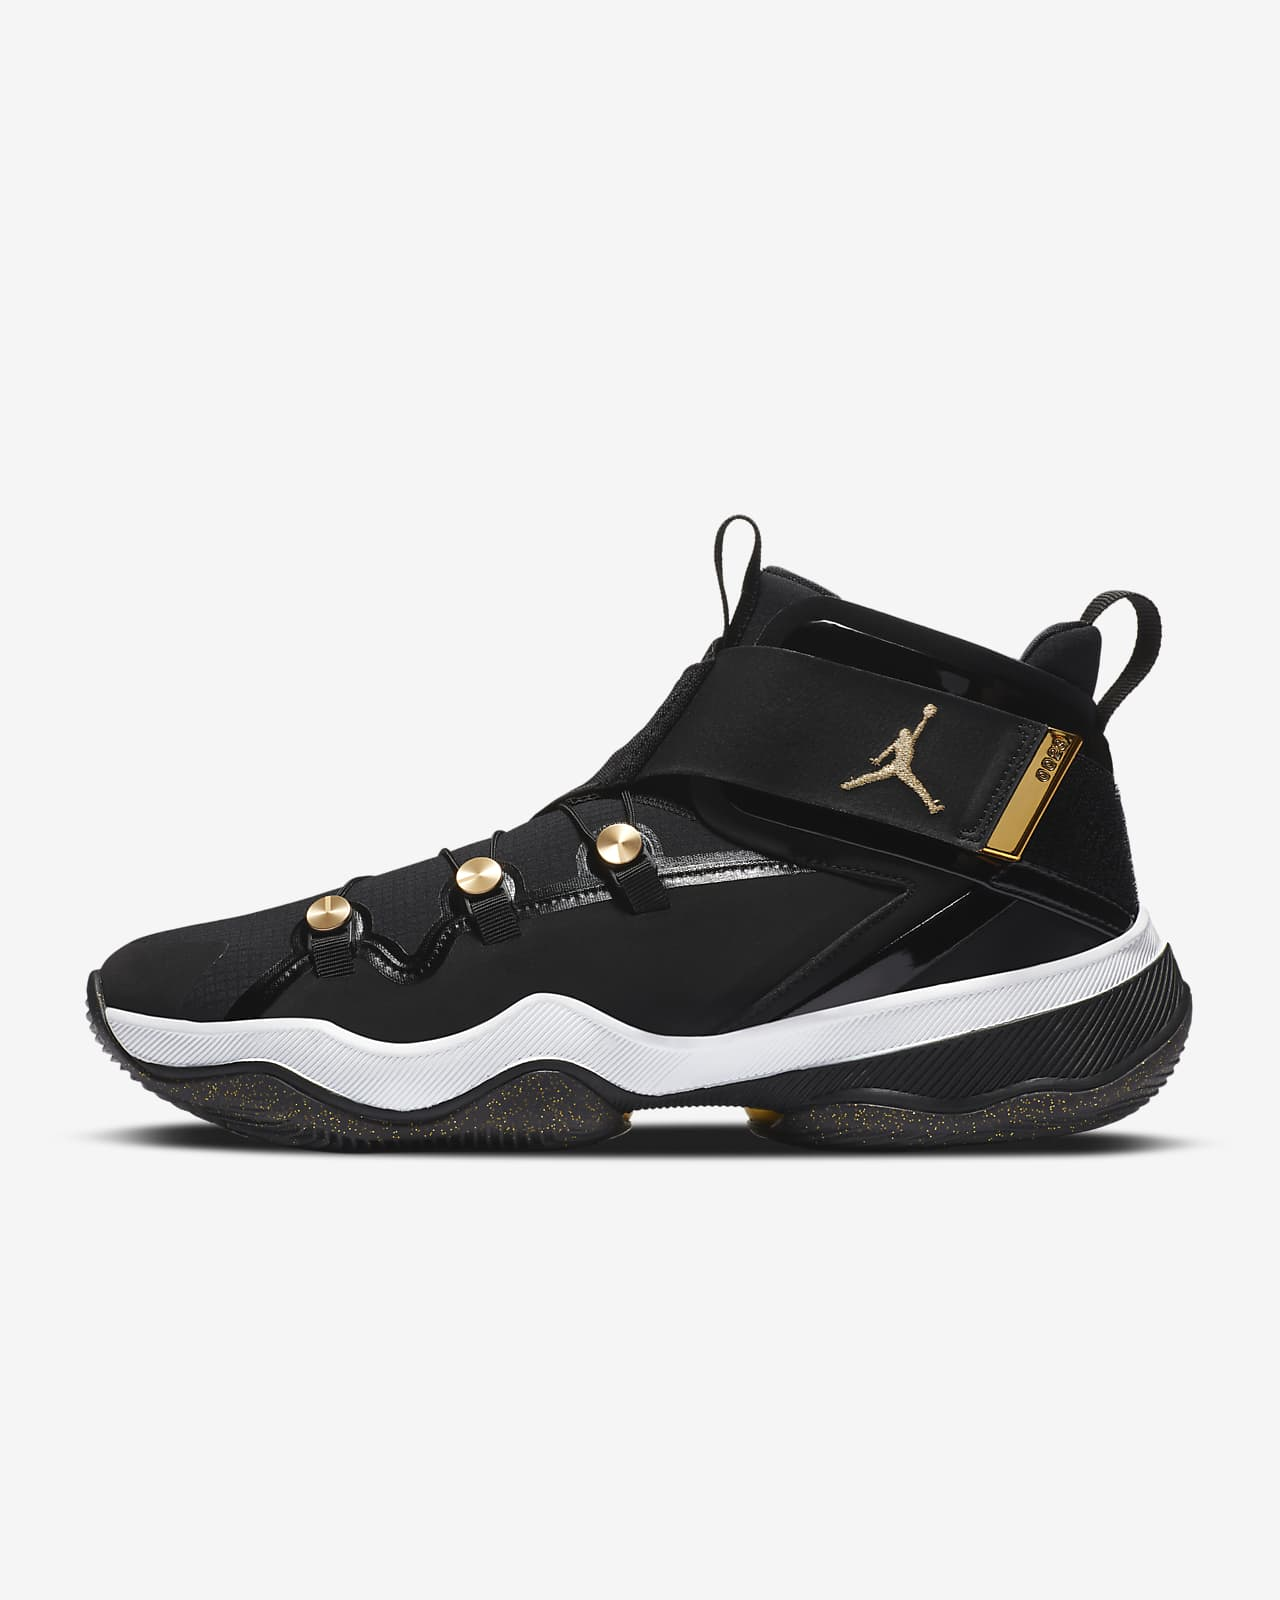 Jordan AJNT 23 Basketball Shoe